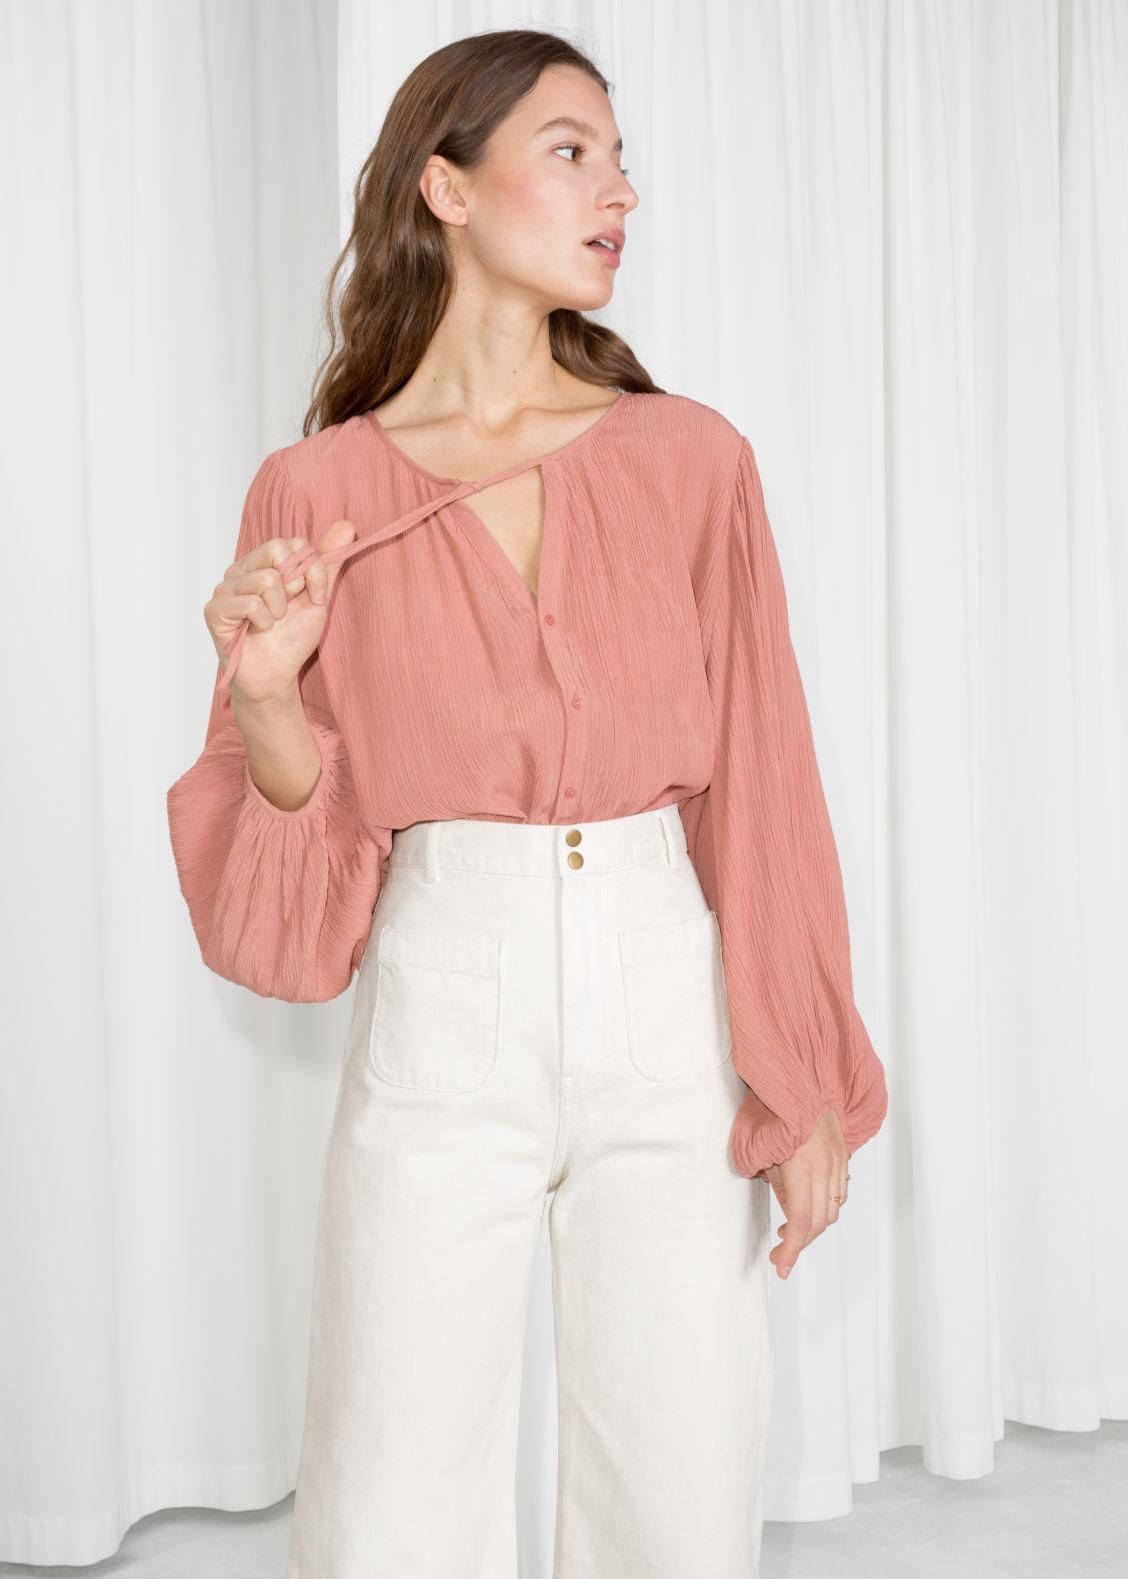 Justrix Women Long Sleeve Fashion Polka Dot Shirt Wear to Work Ladies Blouse